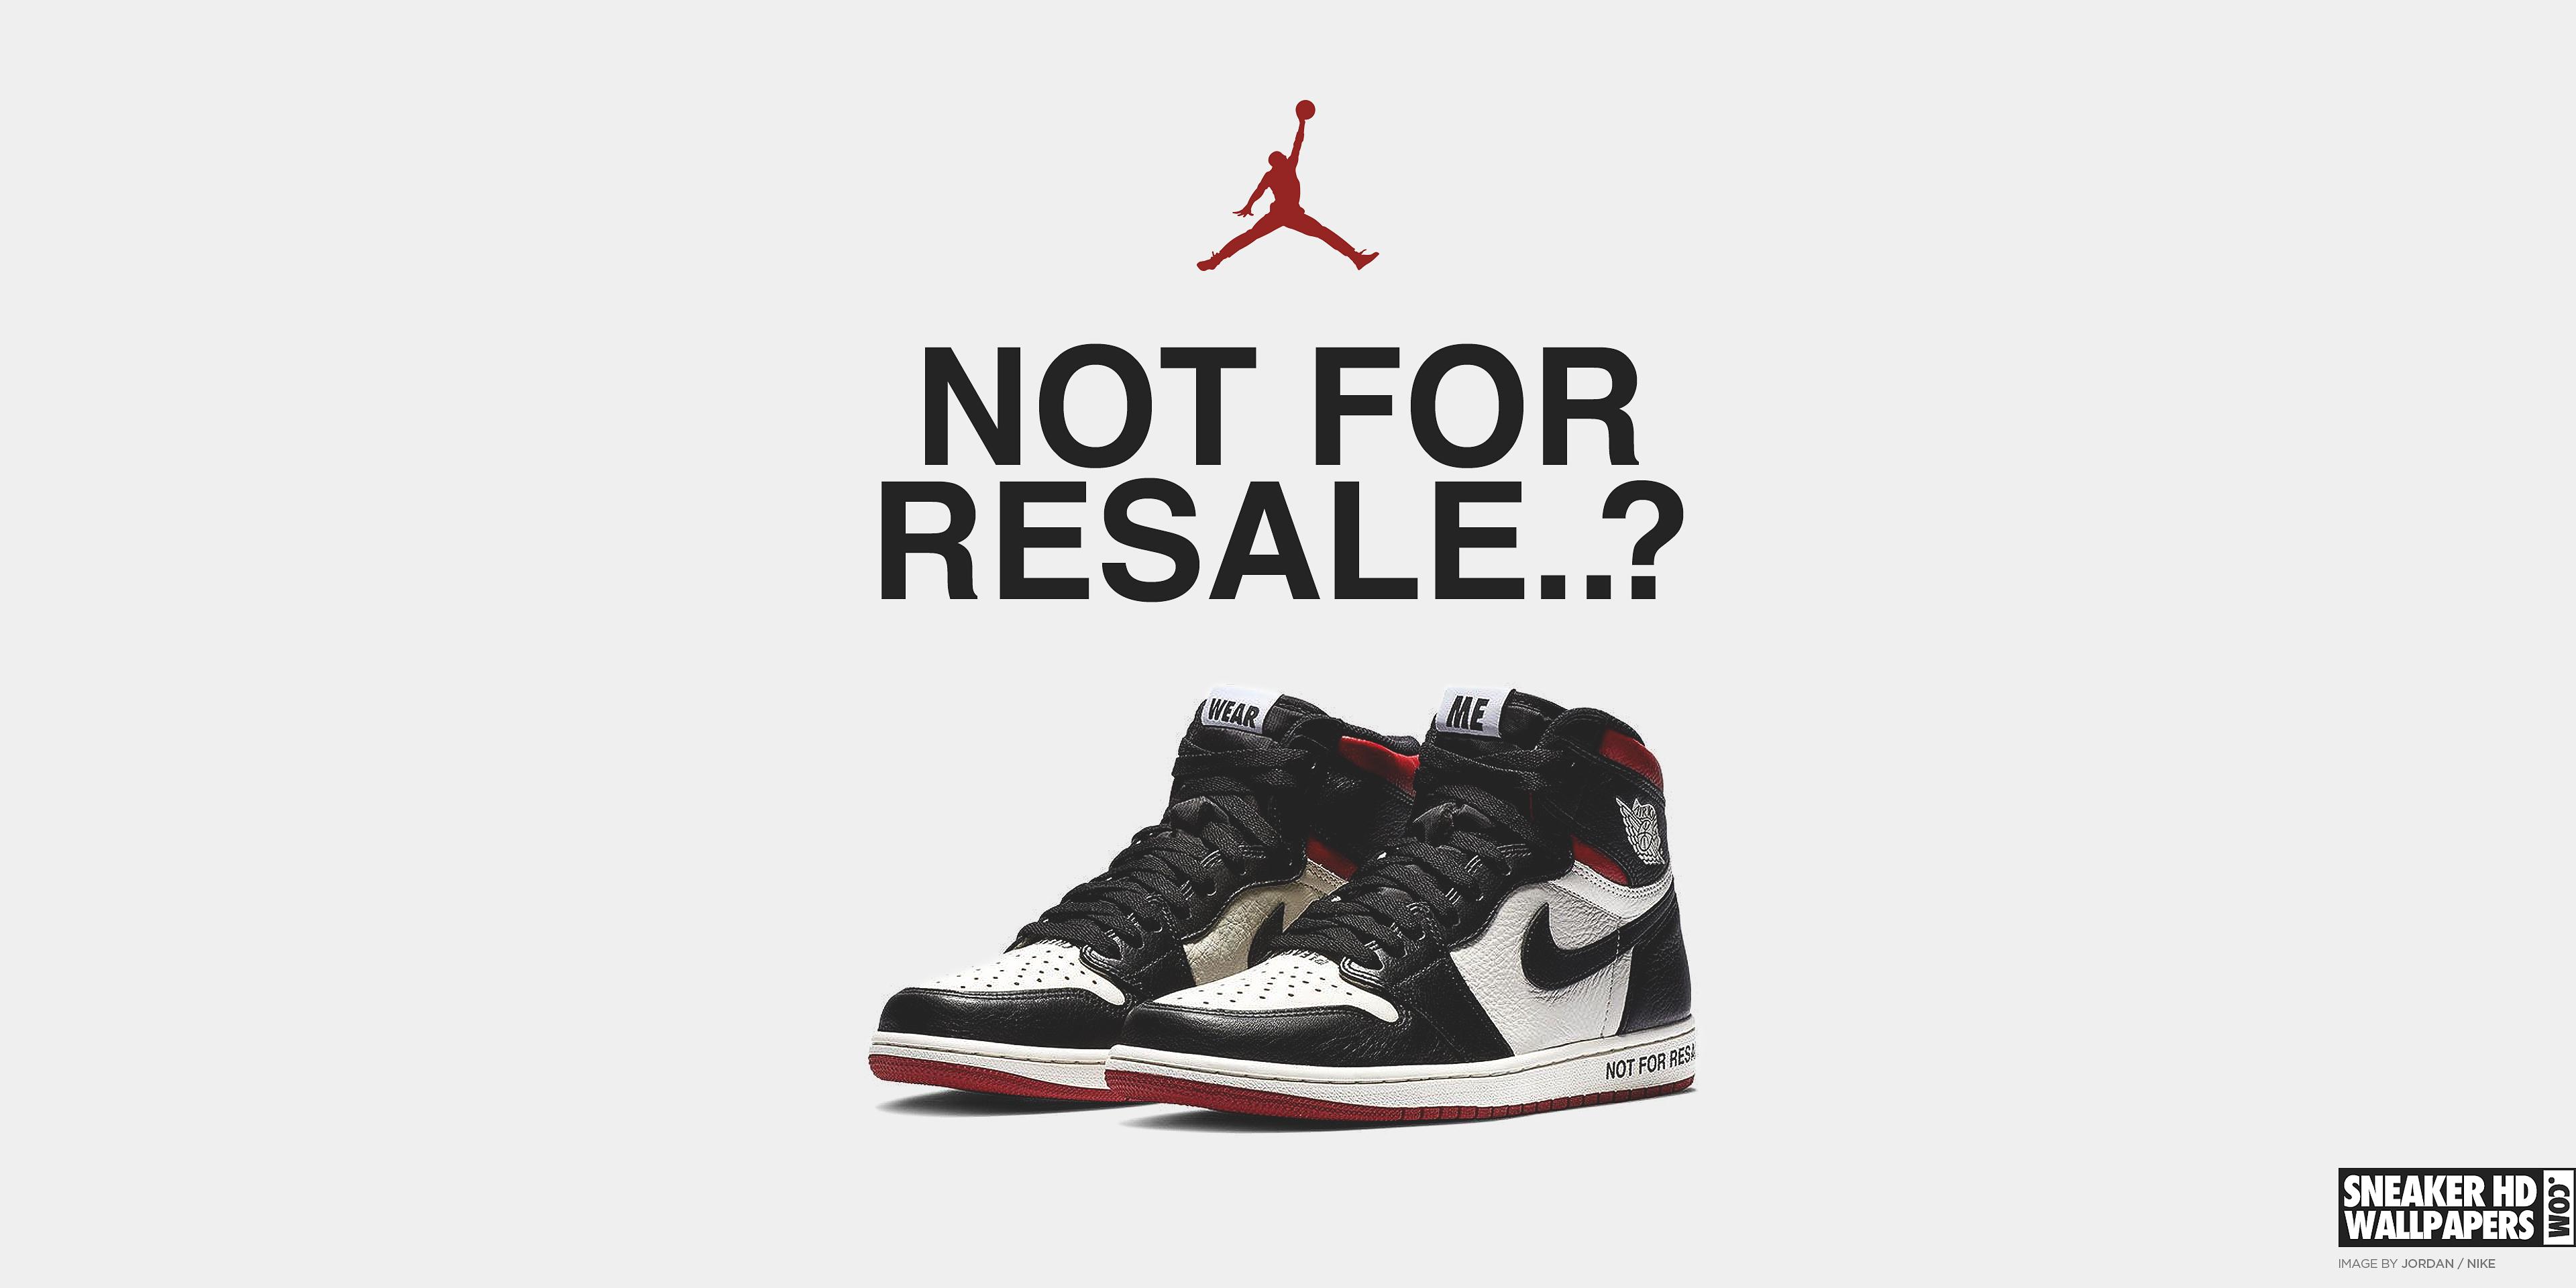 duża obniżka sklep internetowy najtańszy SneakerHDWallpapers.com – Your favorite sneakers in HD and ...